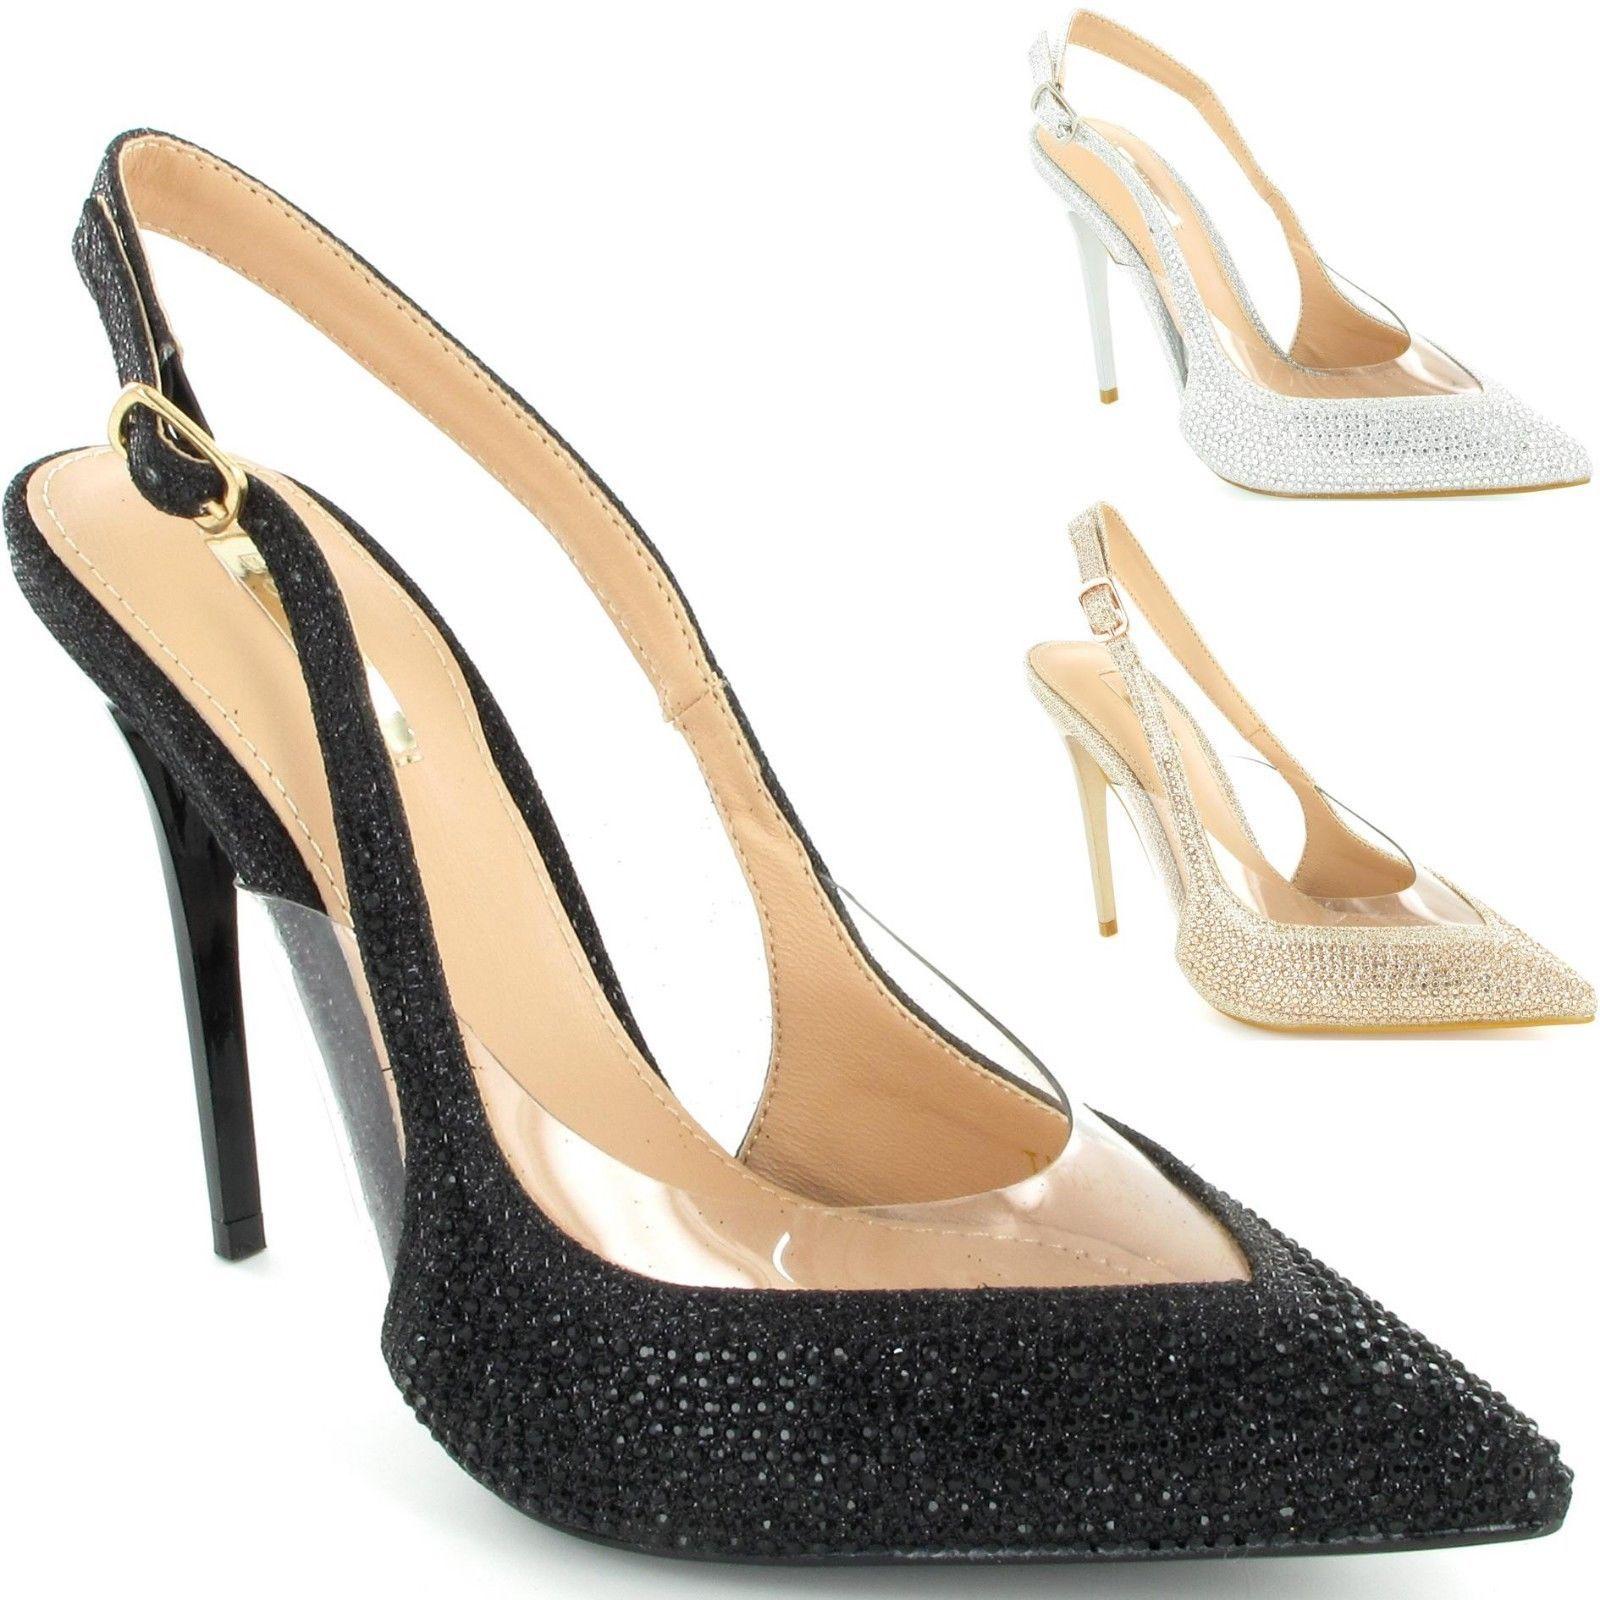 d3686deefba NOSY ALIGLITTER PVC 100 China Blue Glitter - Women Shoes - Christian  Louboutin